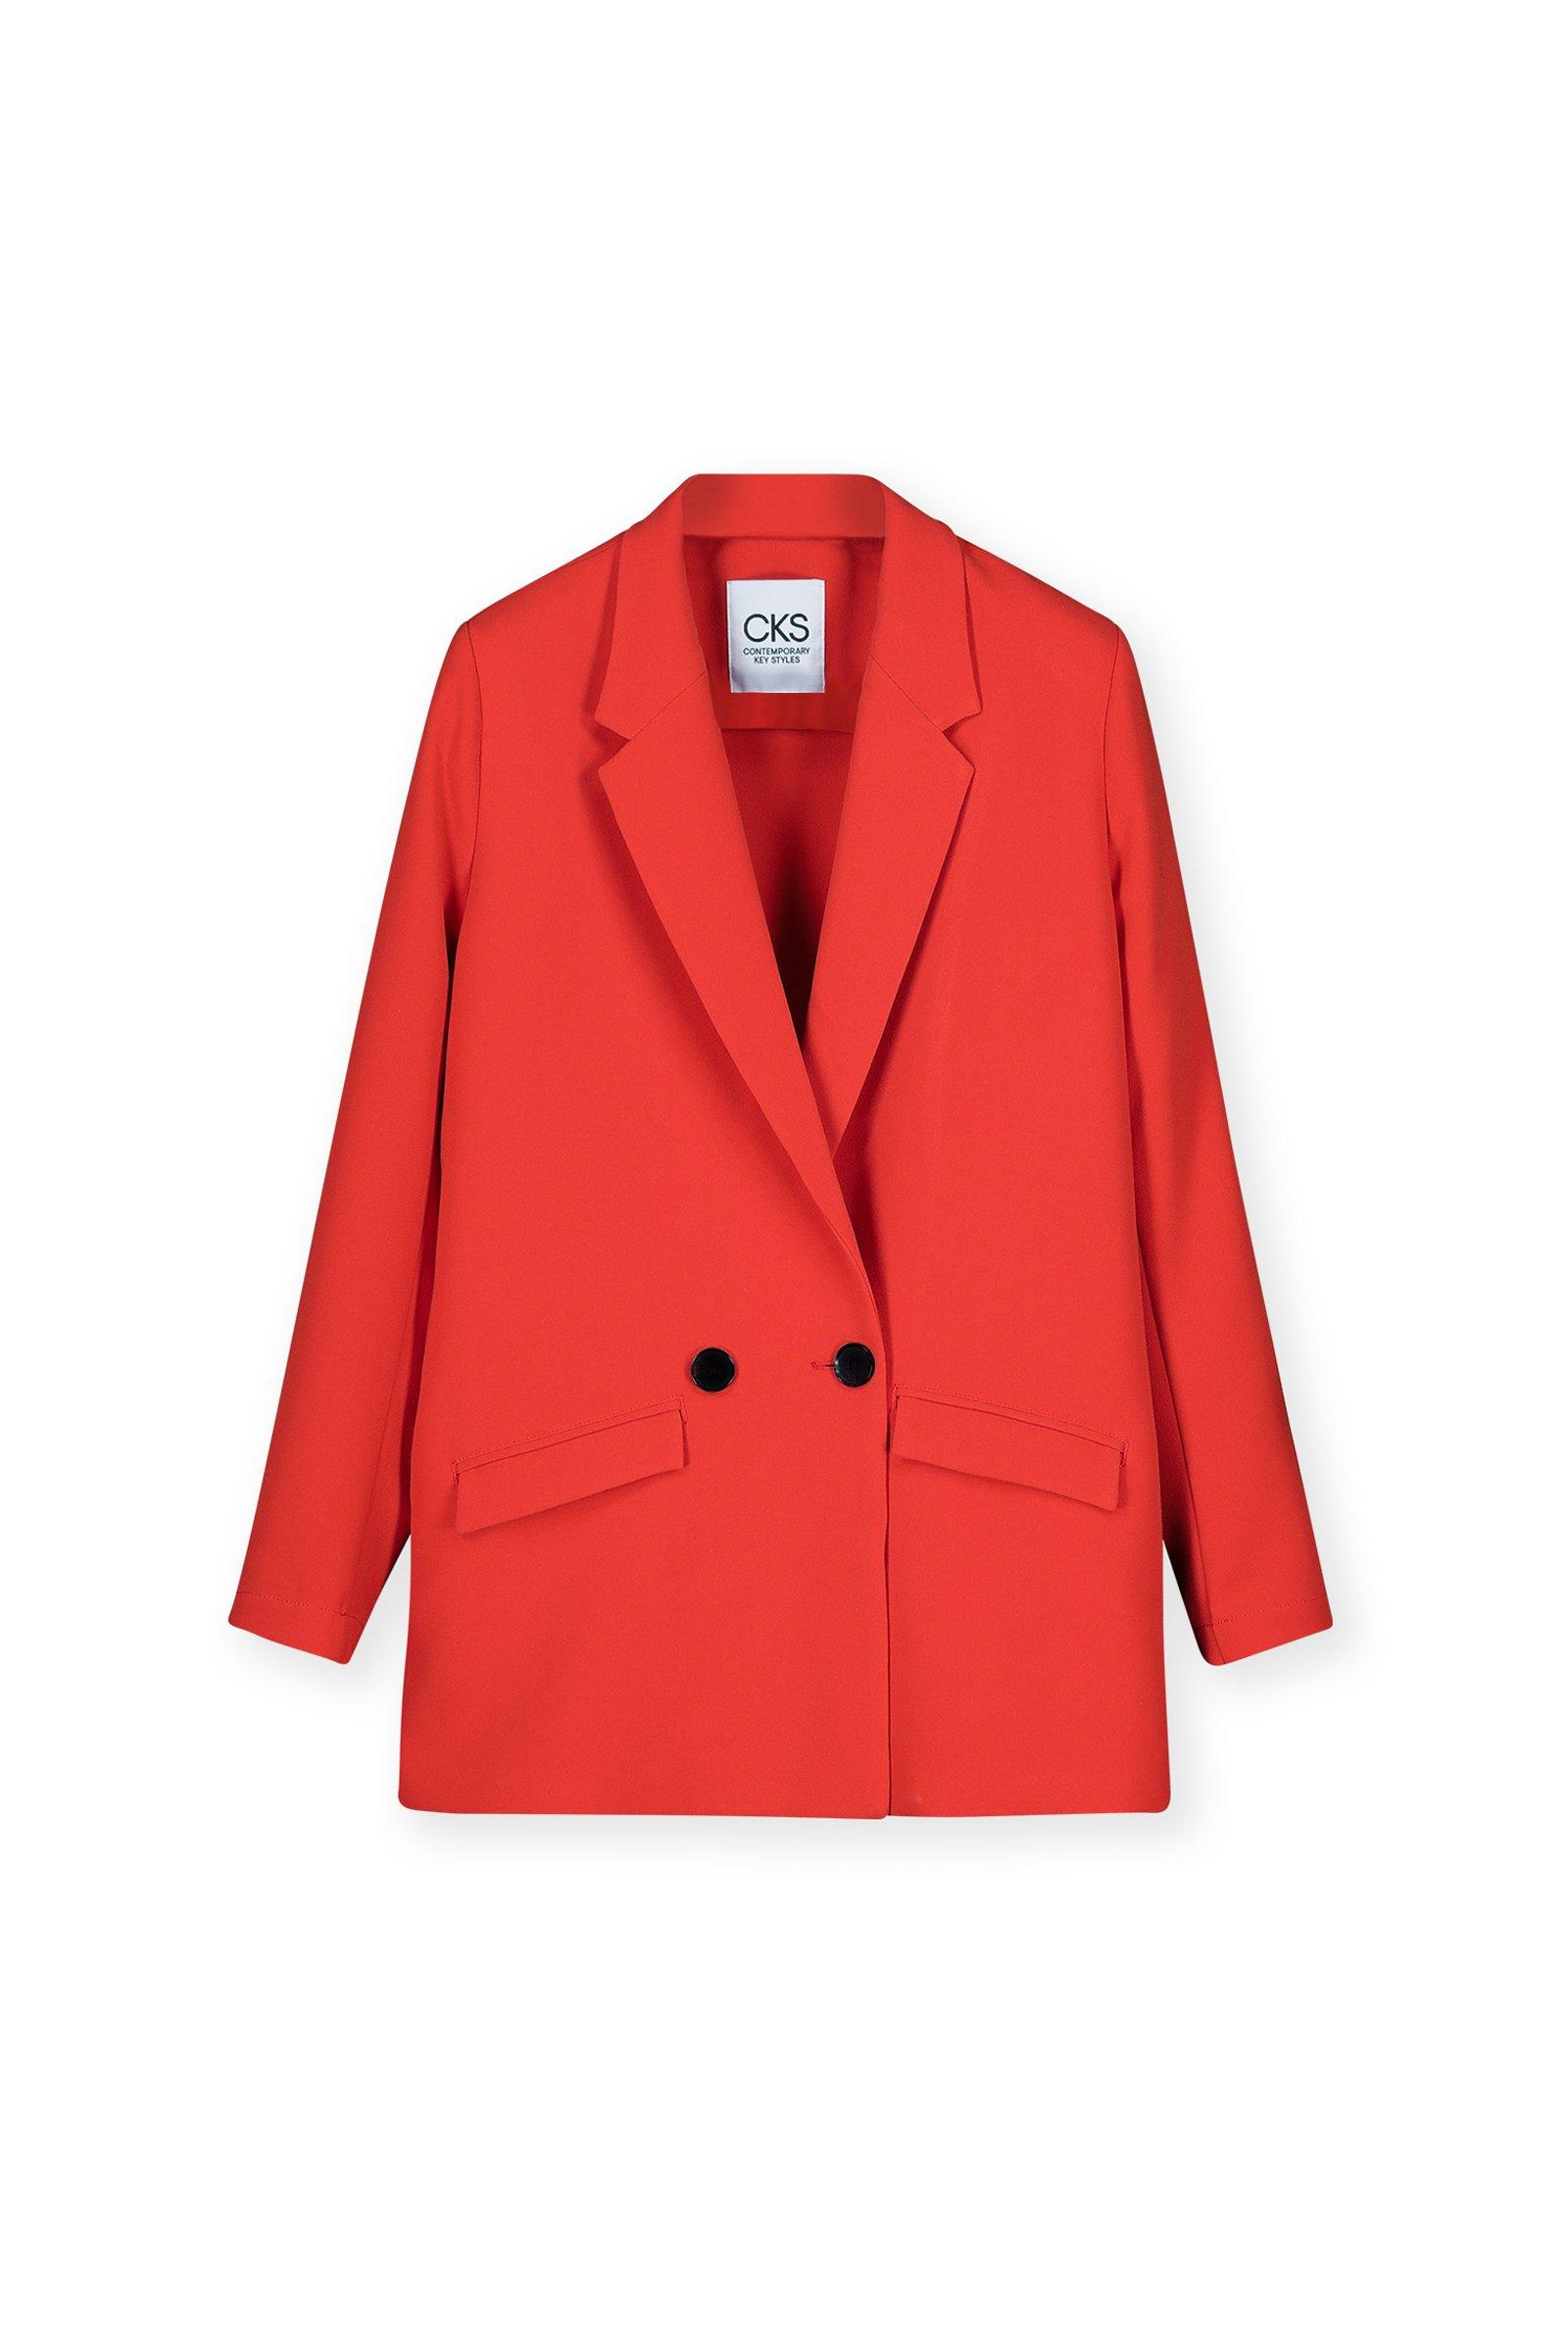 CKS Dames - LAGARUSA - lange blazer - rood